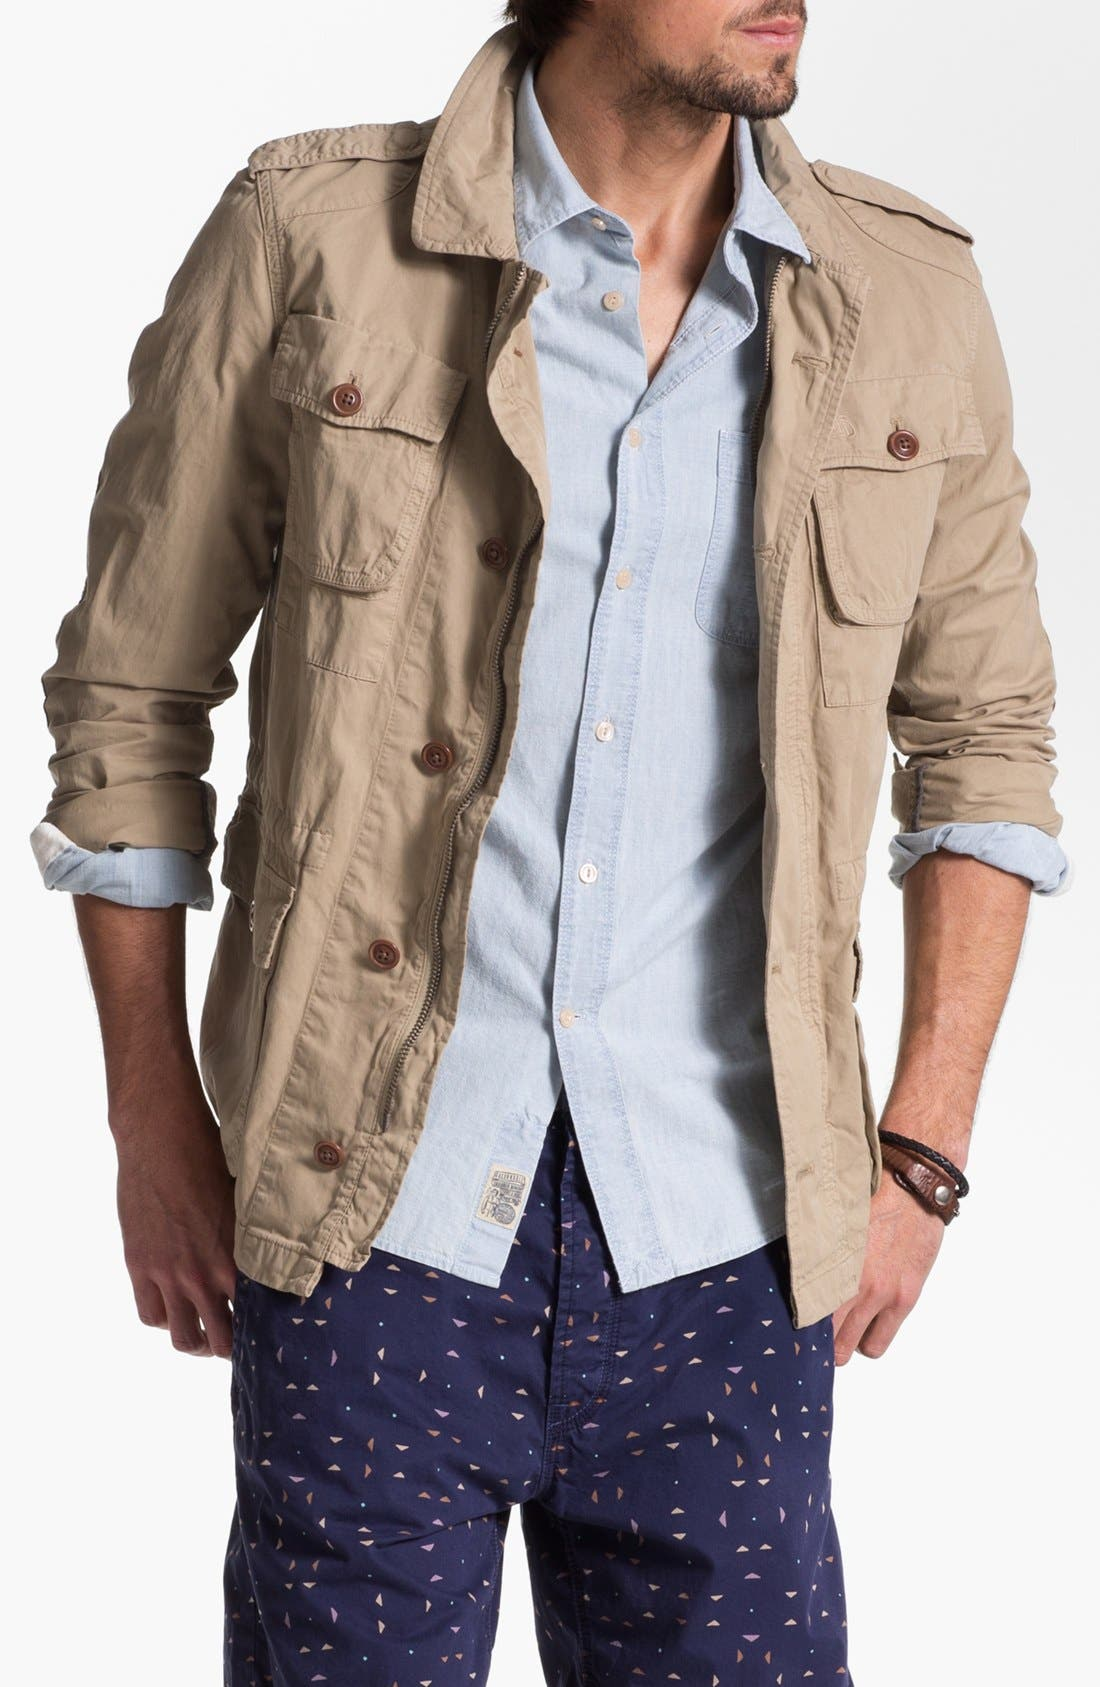 Alternate Image 1 Selected - Façonnable Tailored Denim Field Jacket